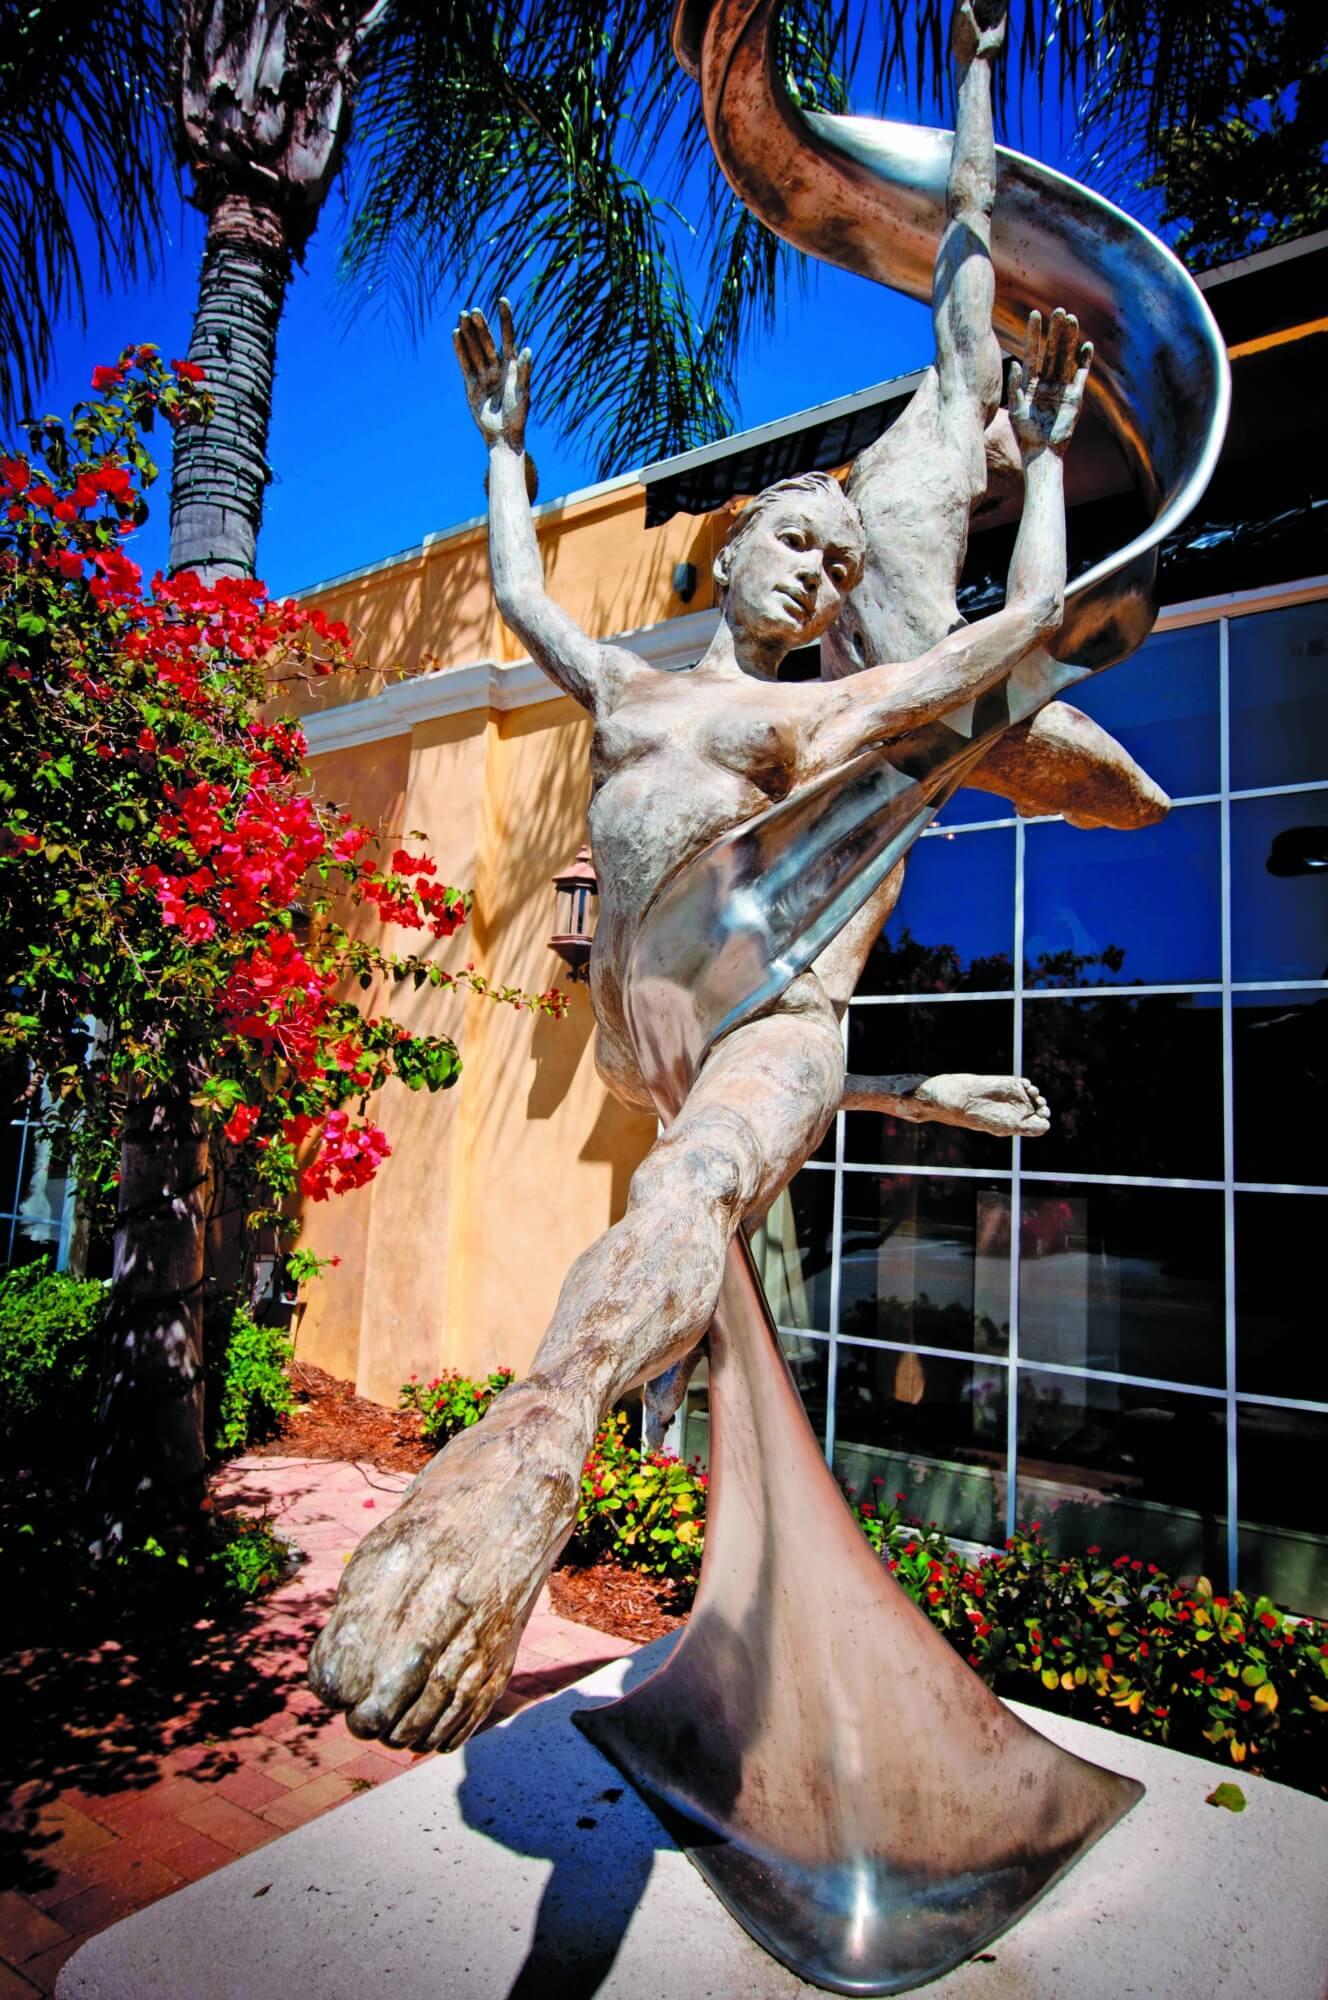 MustDo.com | Art Gallery Statue Third Street South Naples, FL. Photo credit Debi Pittman Wilkey